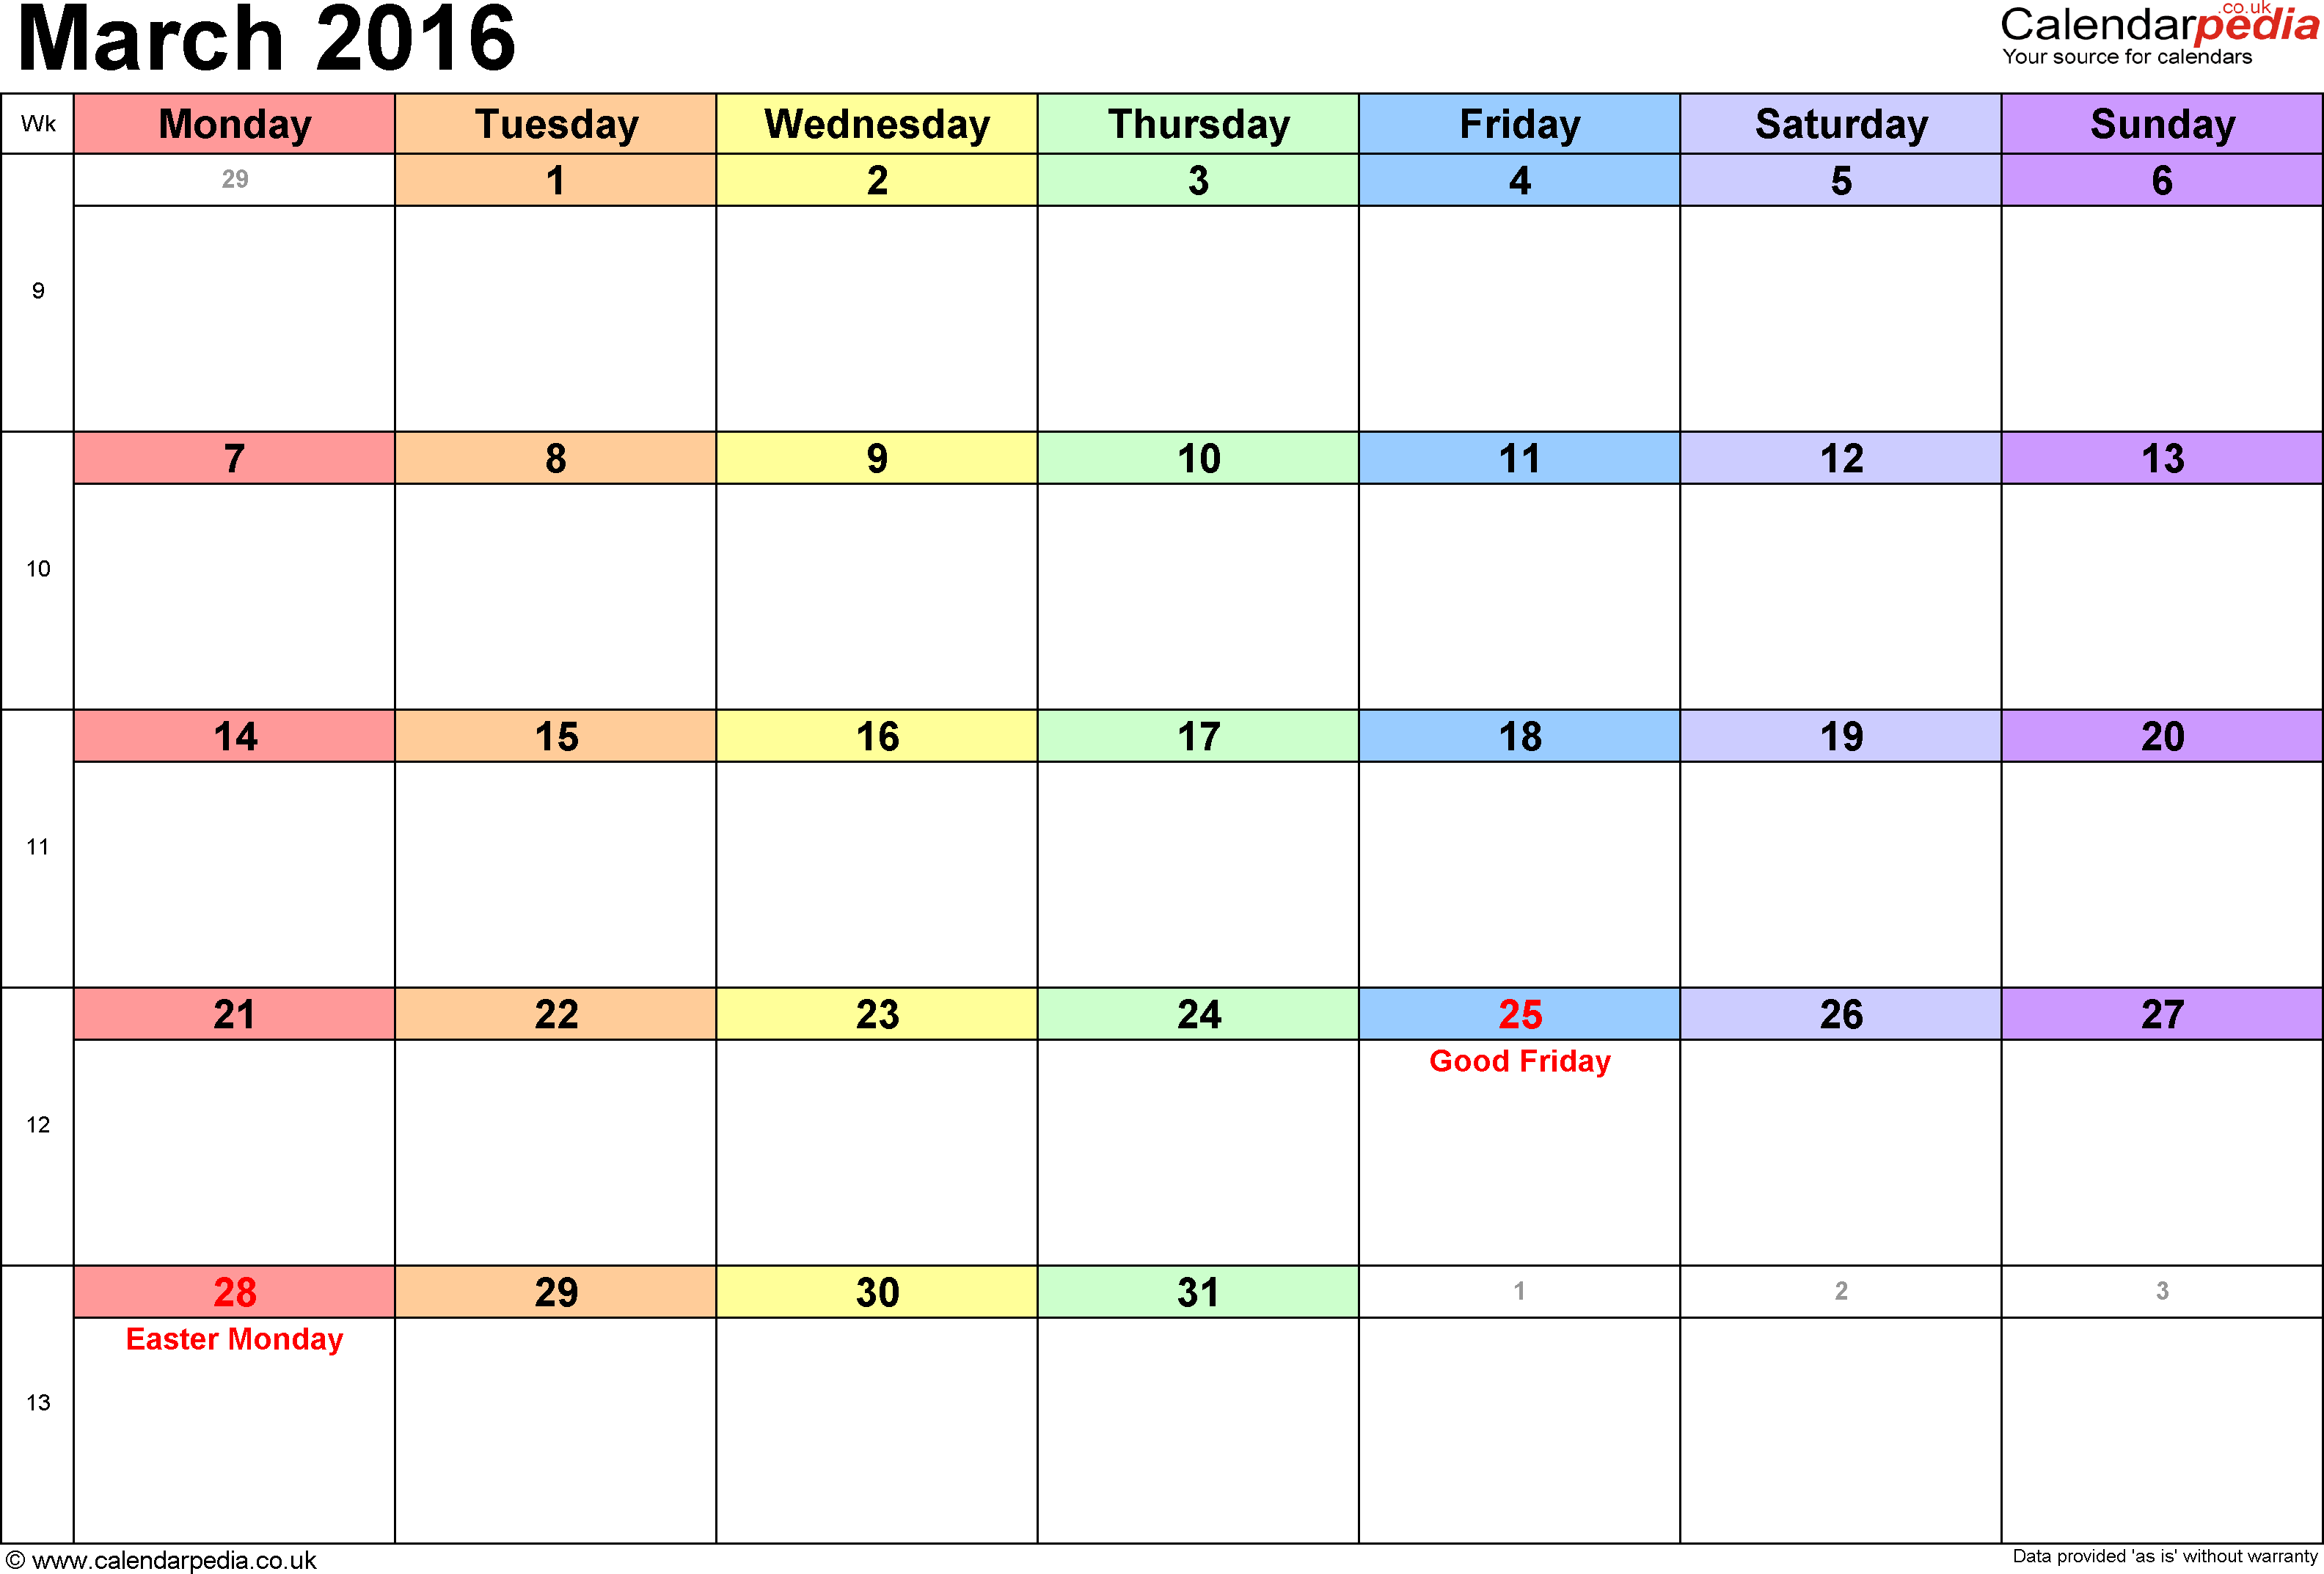 Calendar March 2016 20508 MOVDATA 3168x2146